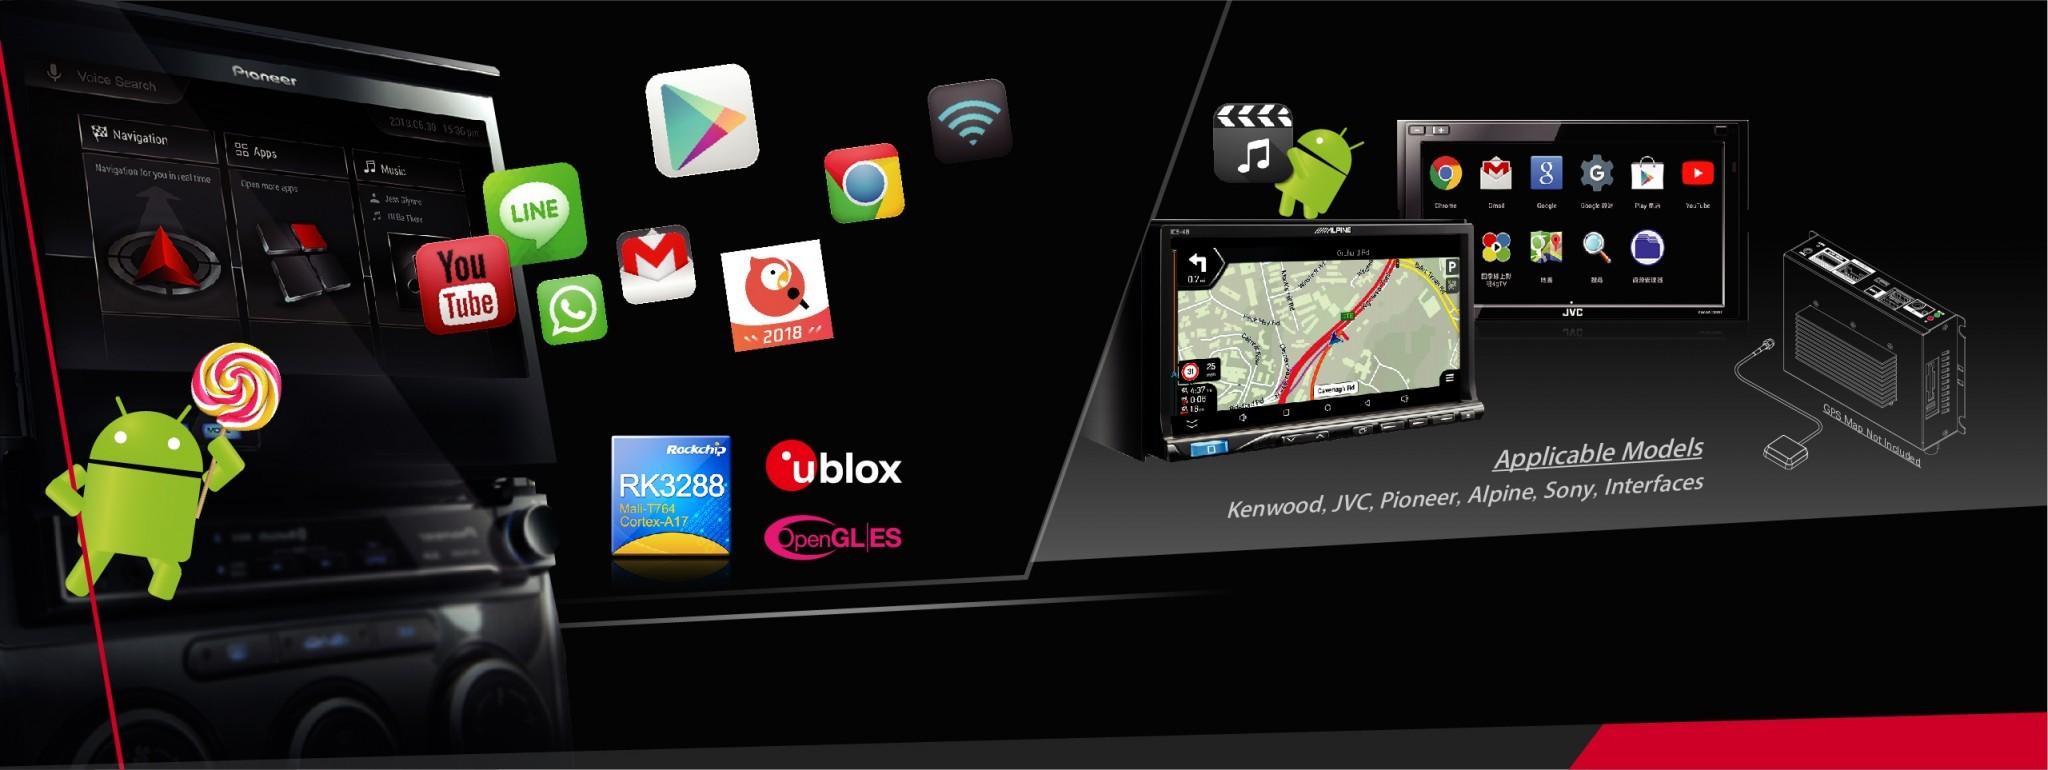 2560x962_AndroidBox-01